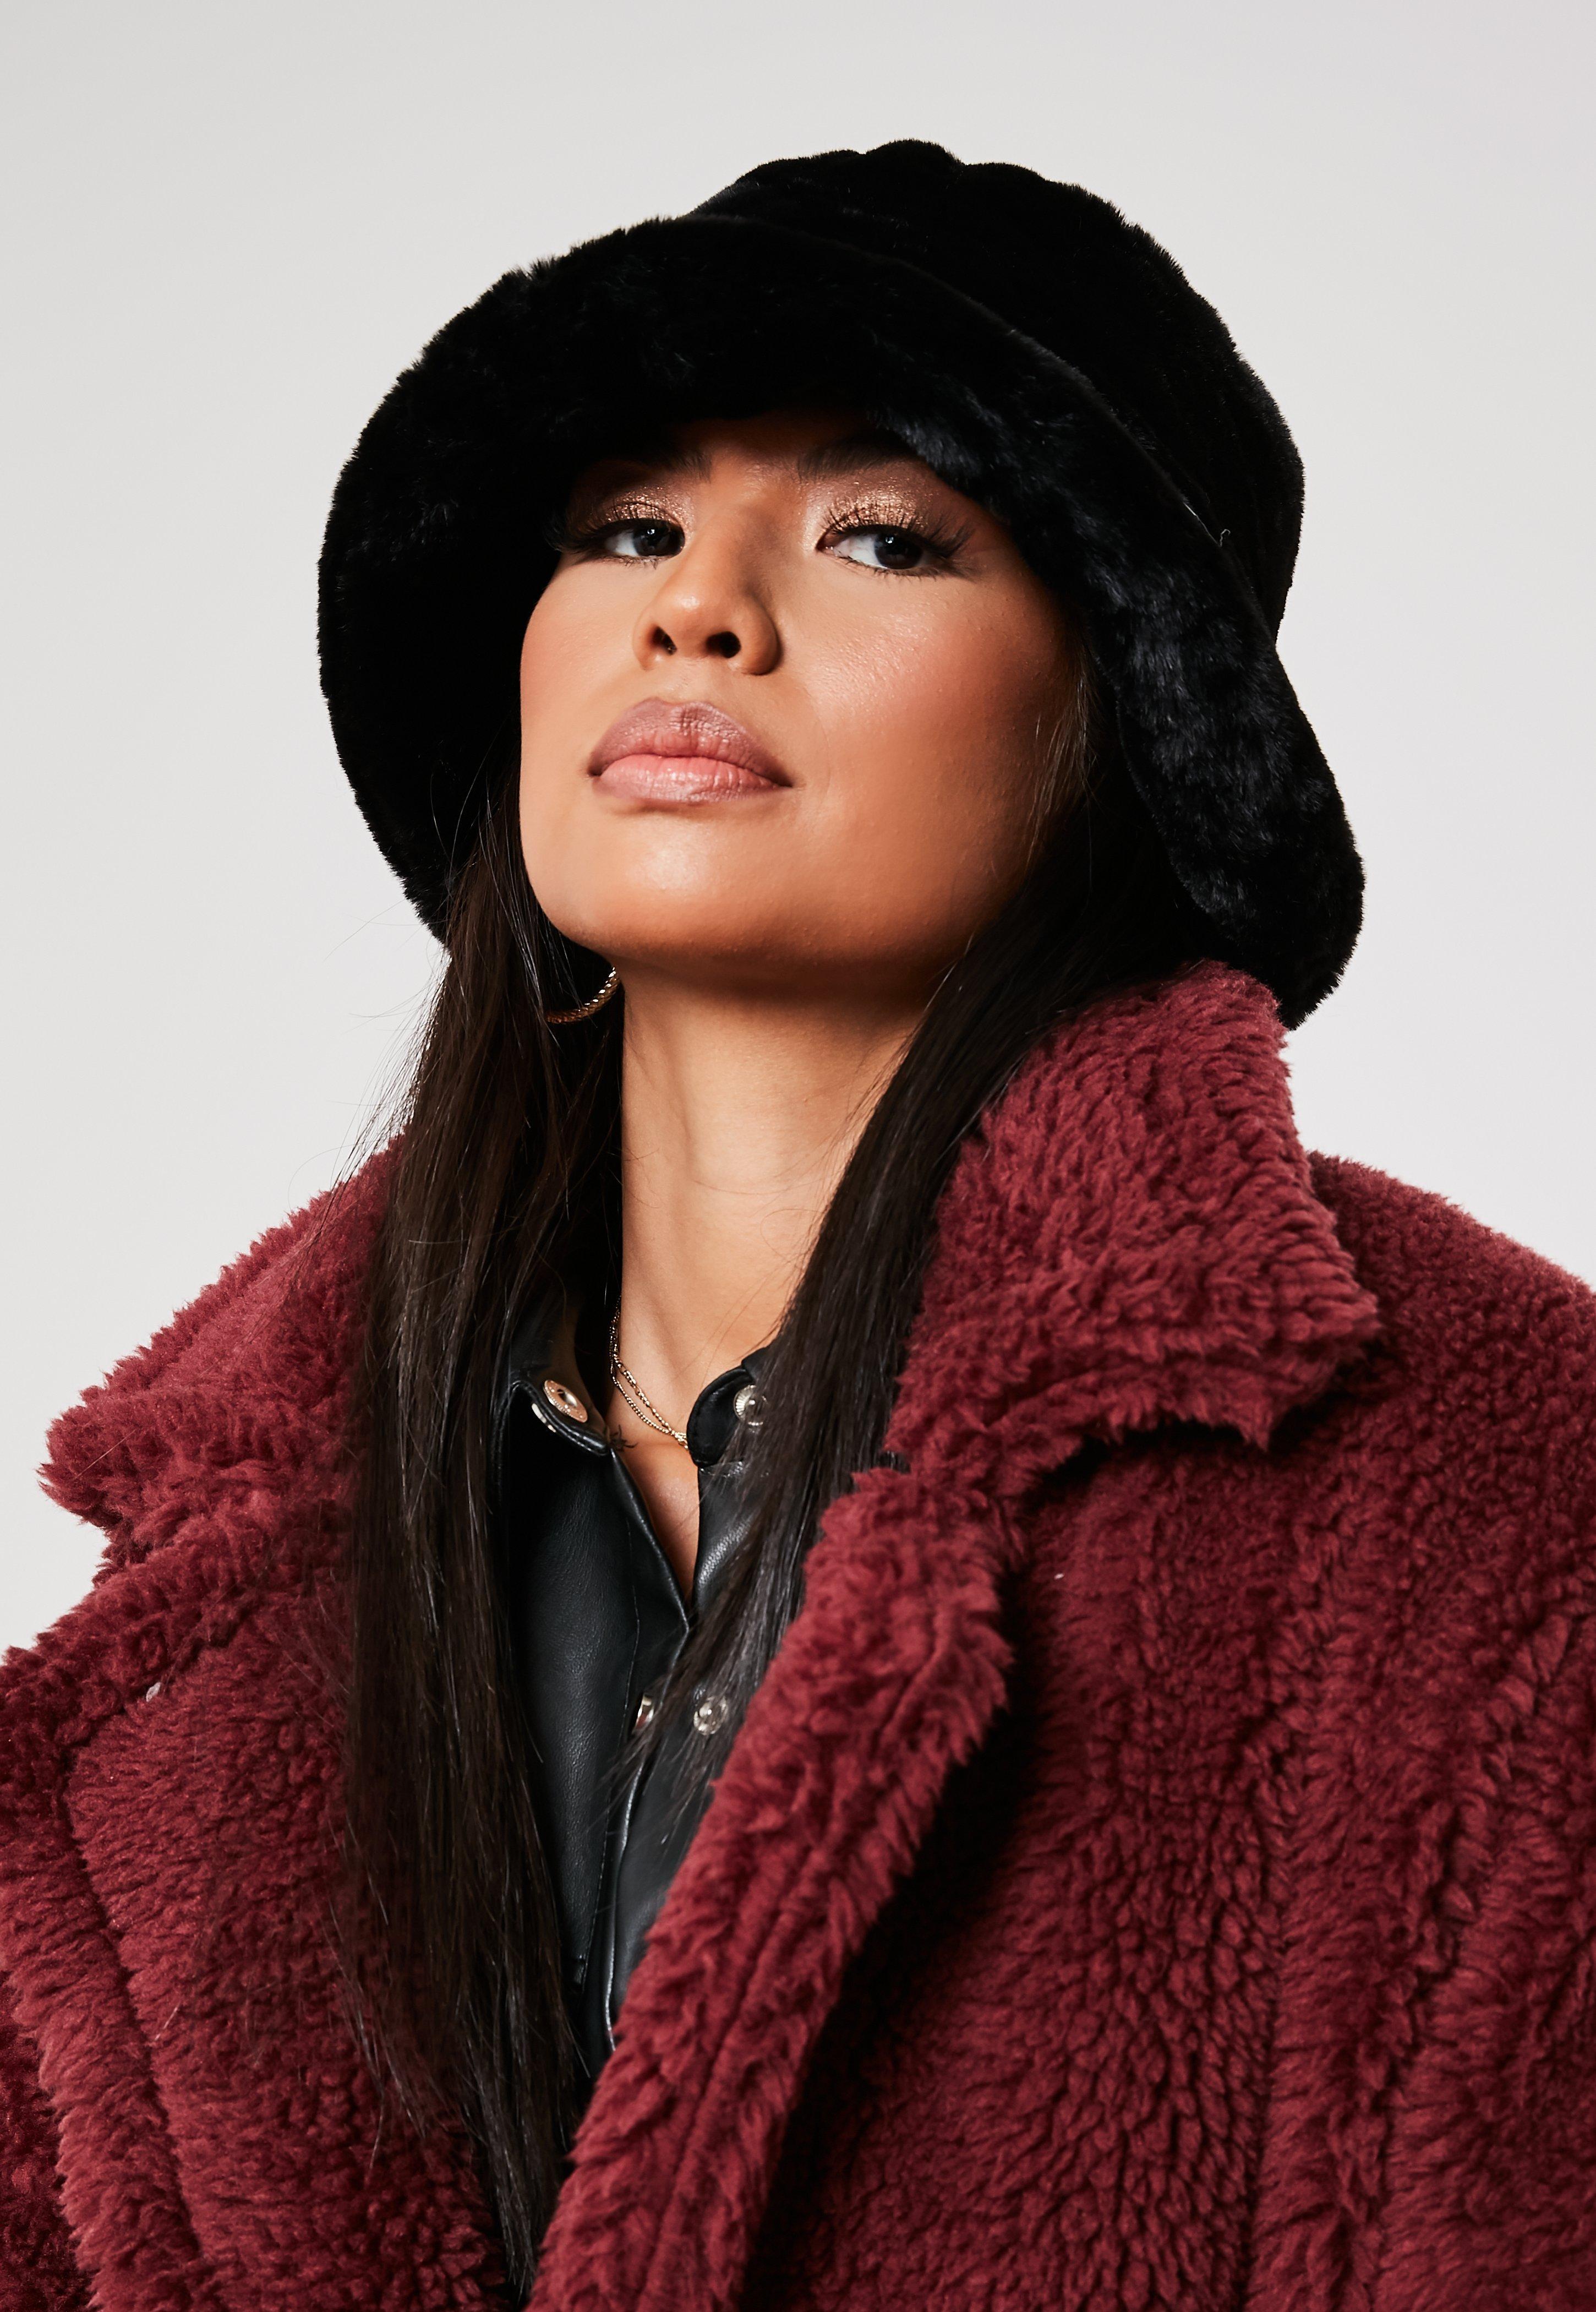 Fur Bucket Hat Review Dc4ff 5792a